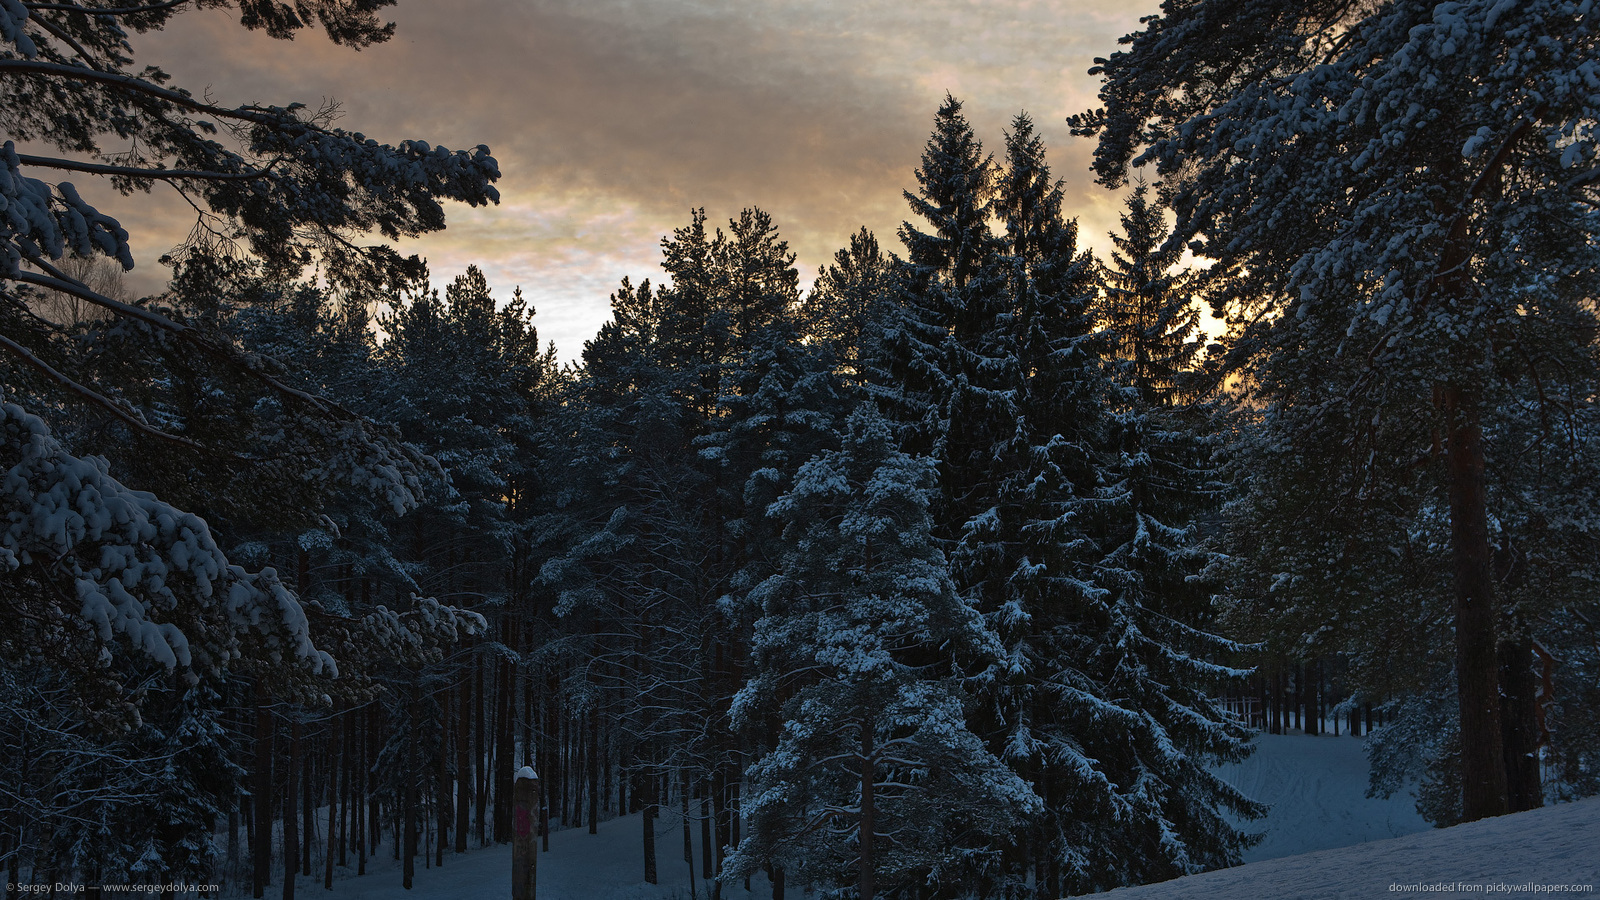 Download 1600x900 Snowy Pine Trees Wallpaper 1600x900